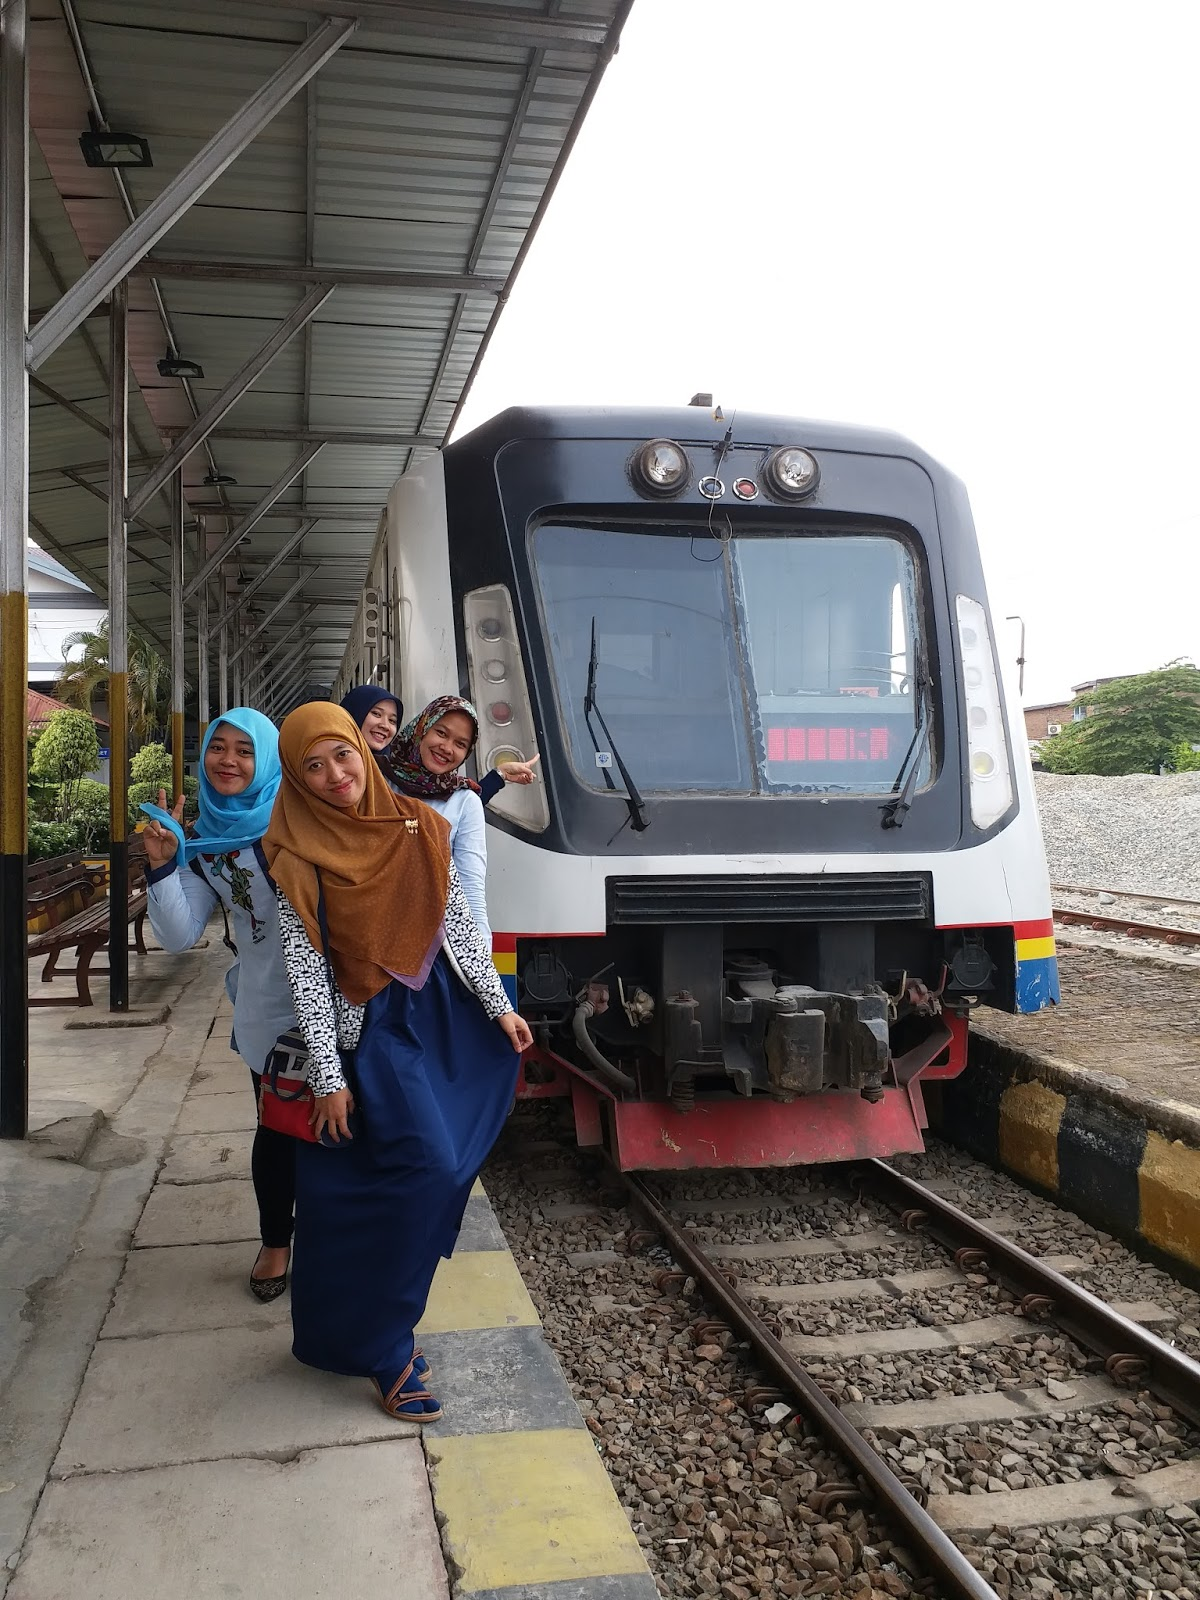 Berwisata Murah dan Singkat dengan Kereta Api ke Binjai